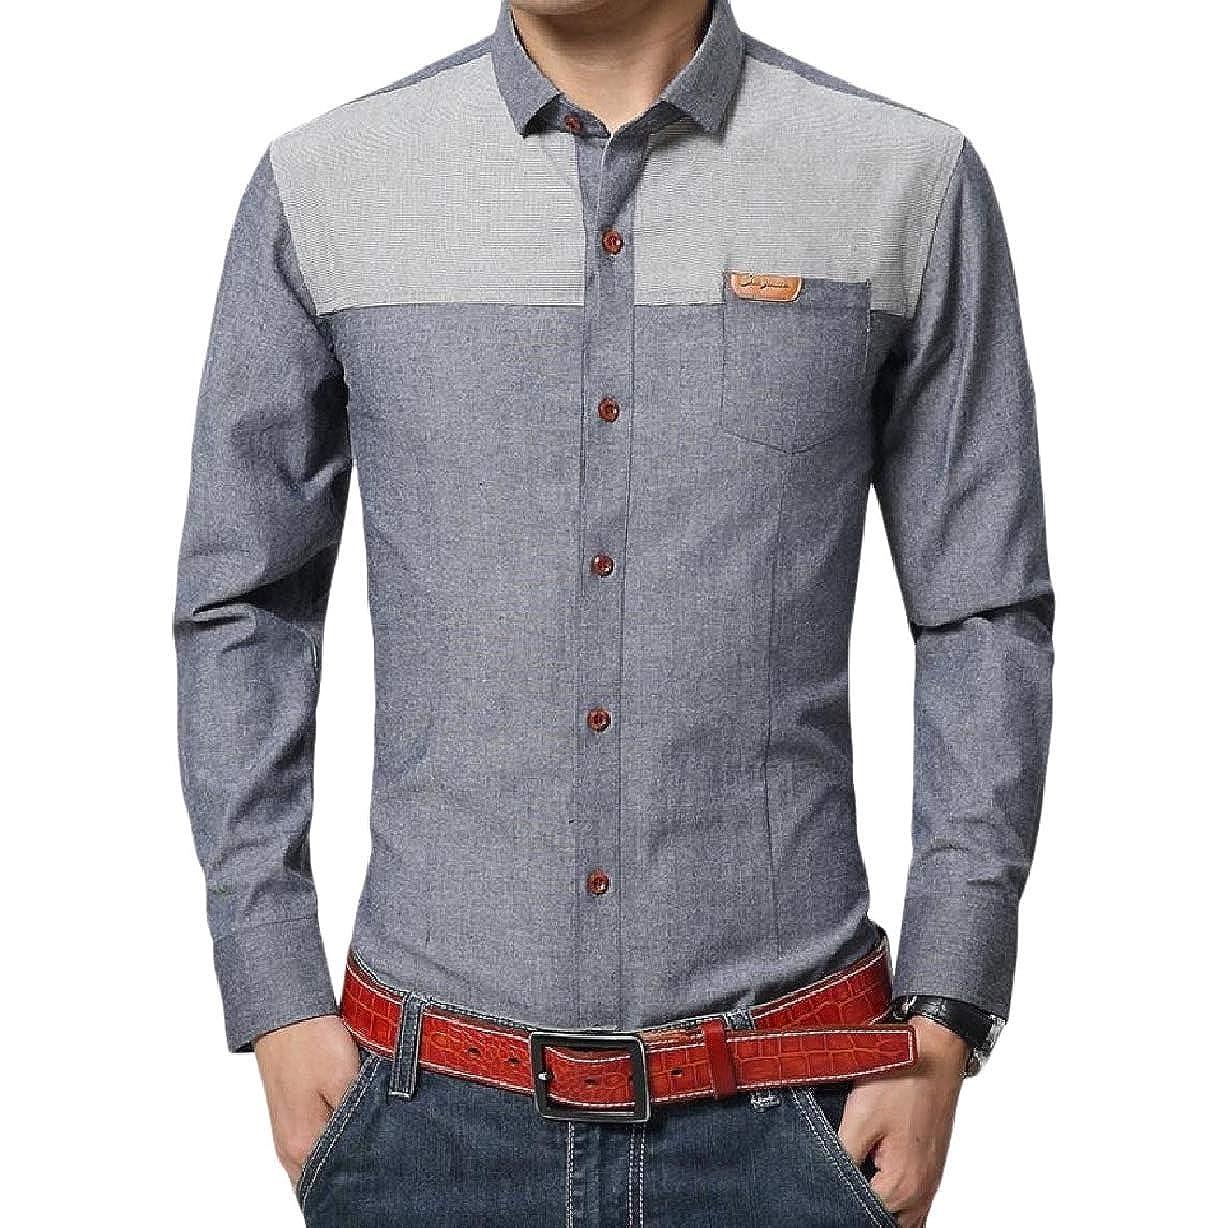 VITryst-Men Formal Cotton Spread Collar Non-Iron Plus Size Woven Shirt